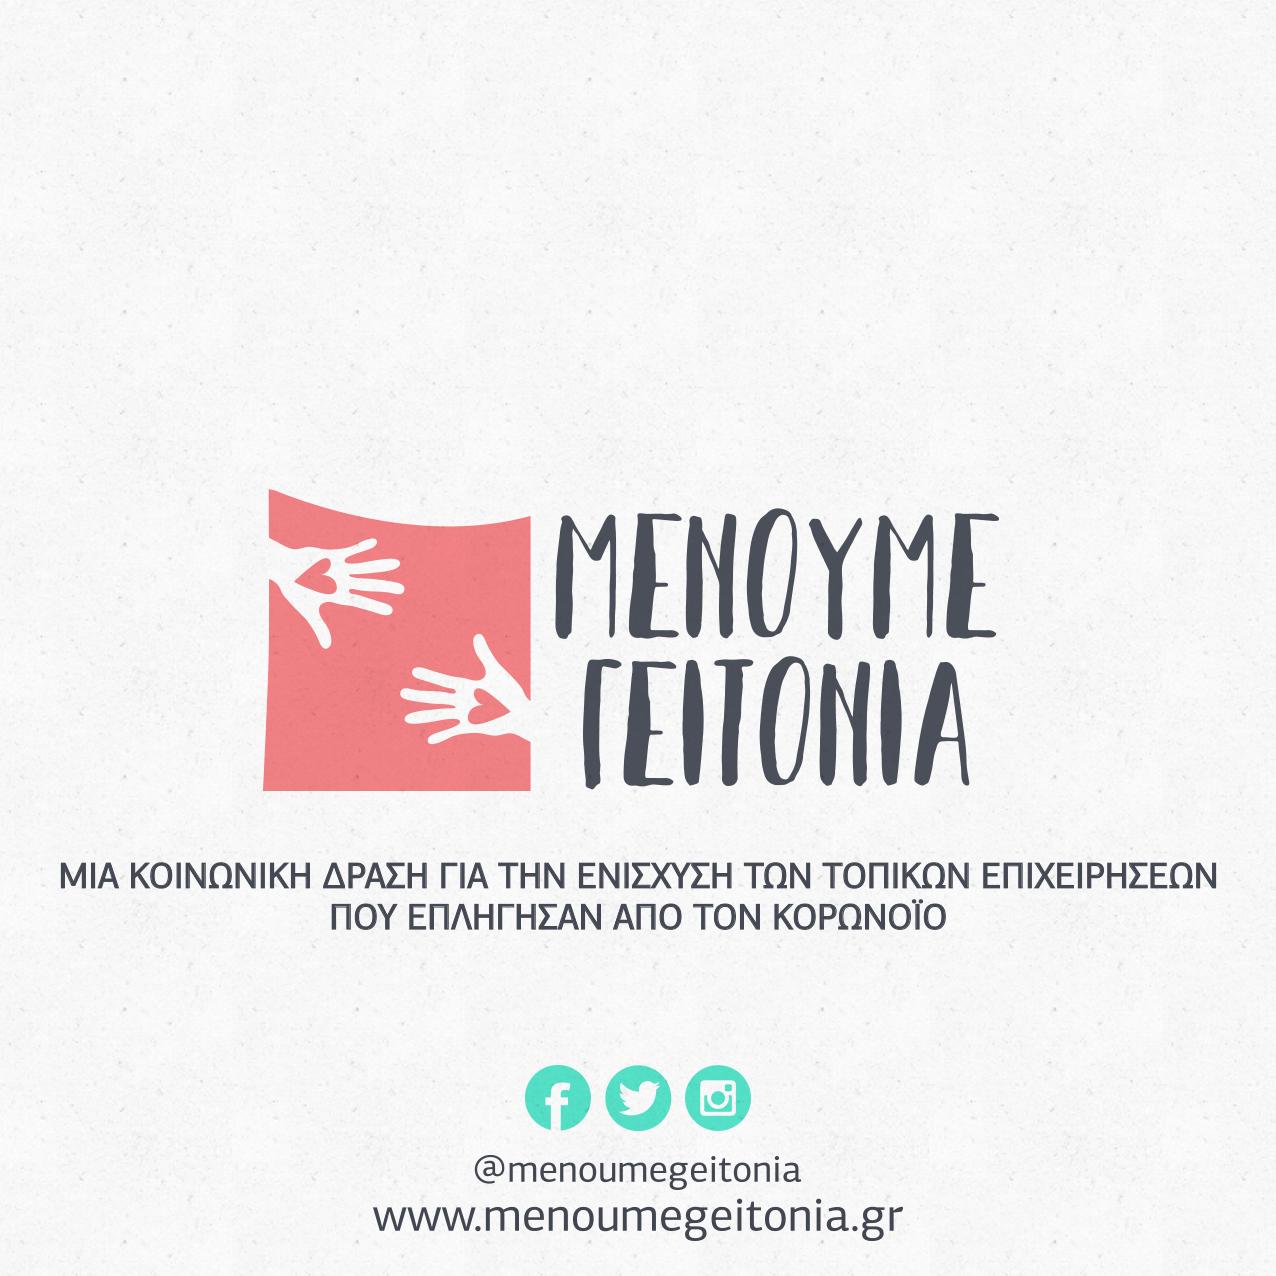 NonProfit Project #menoumegeitonia